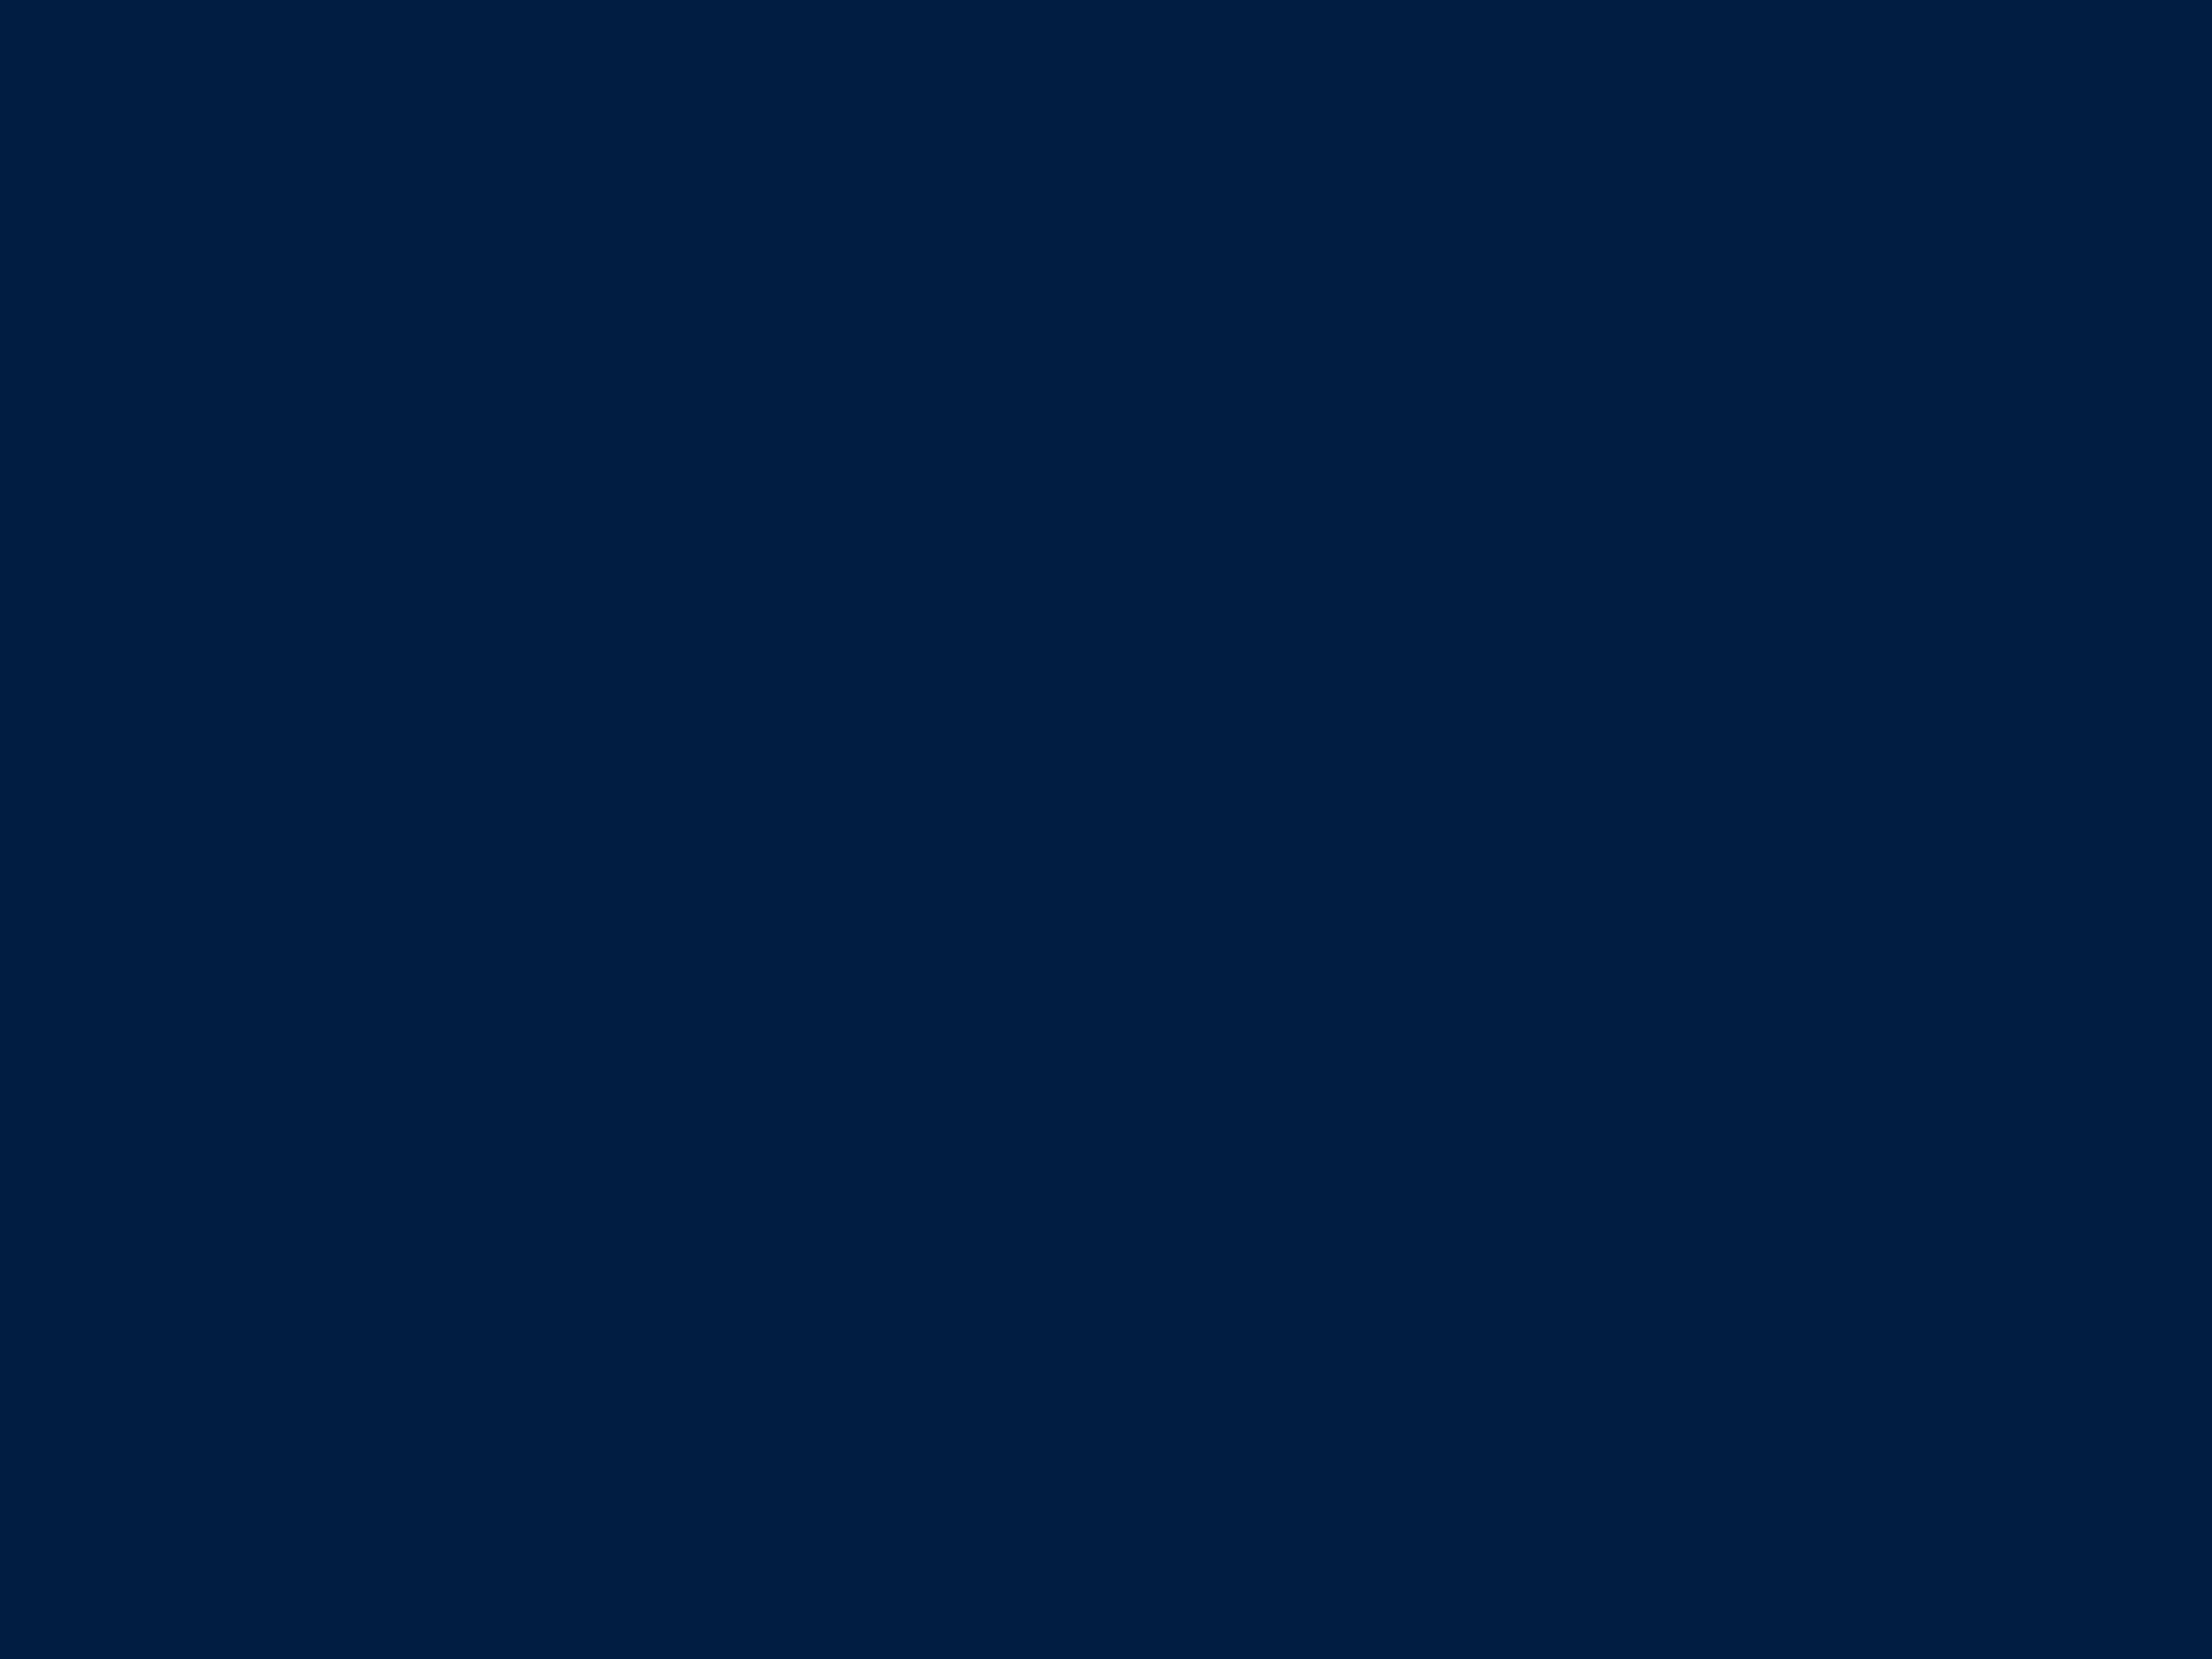 Stationery_Cupboard_Blue.jpg